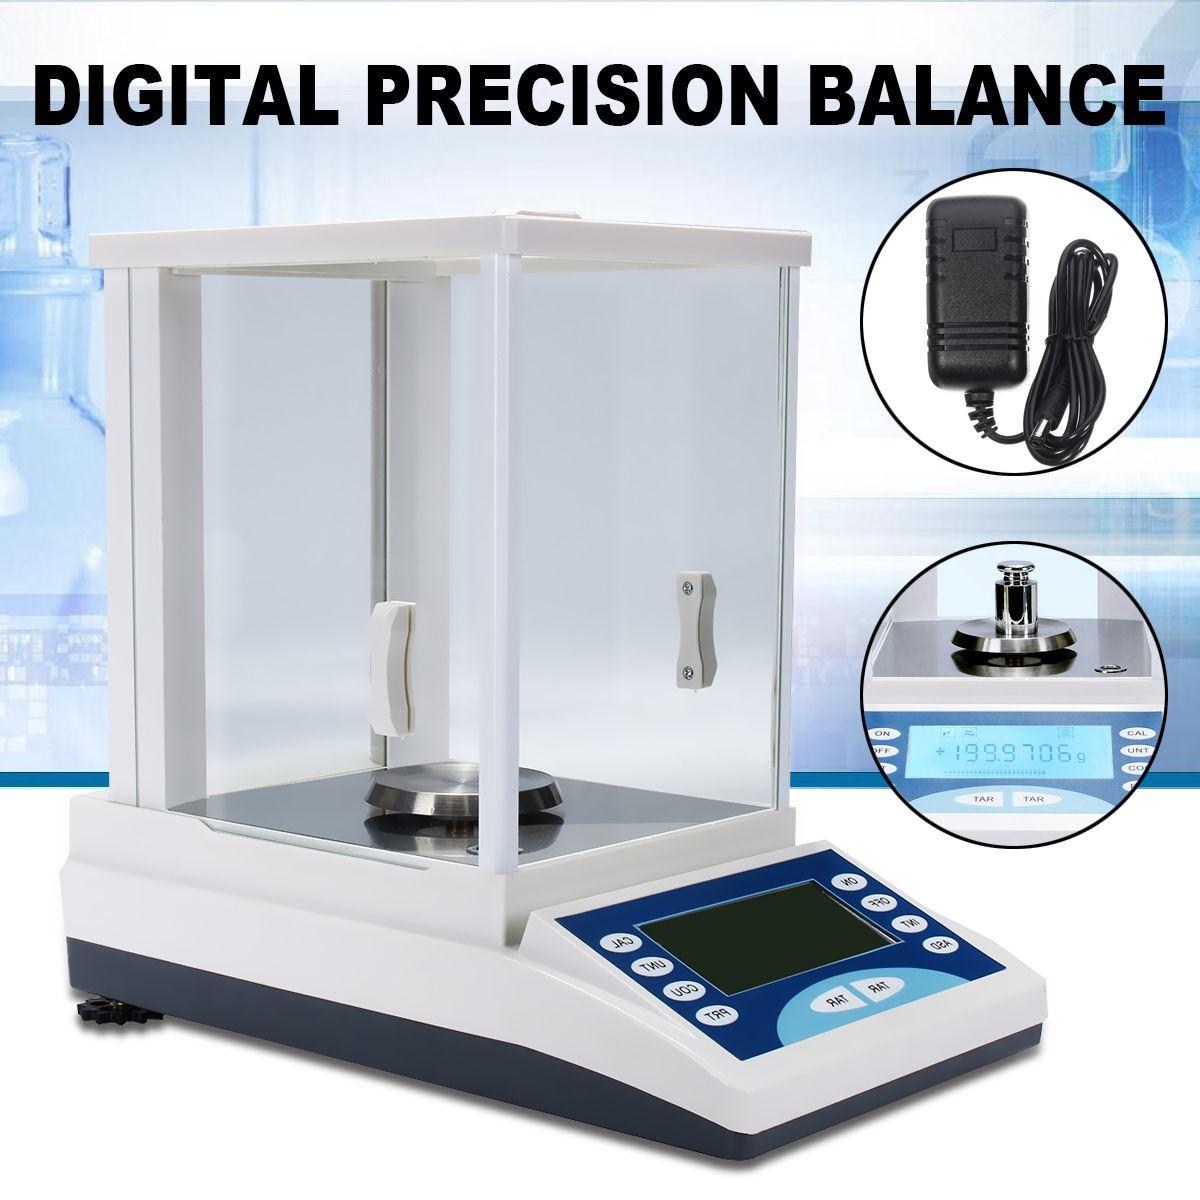 Digital Precision Scale Lab Analytical Balance 200 / 0.0001g 0.1mg 100-240V Top Quality Electronic Balance Aluminum Alloy Base